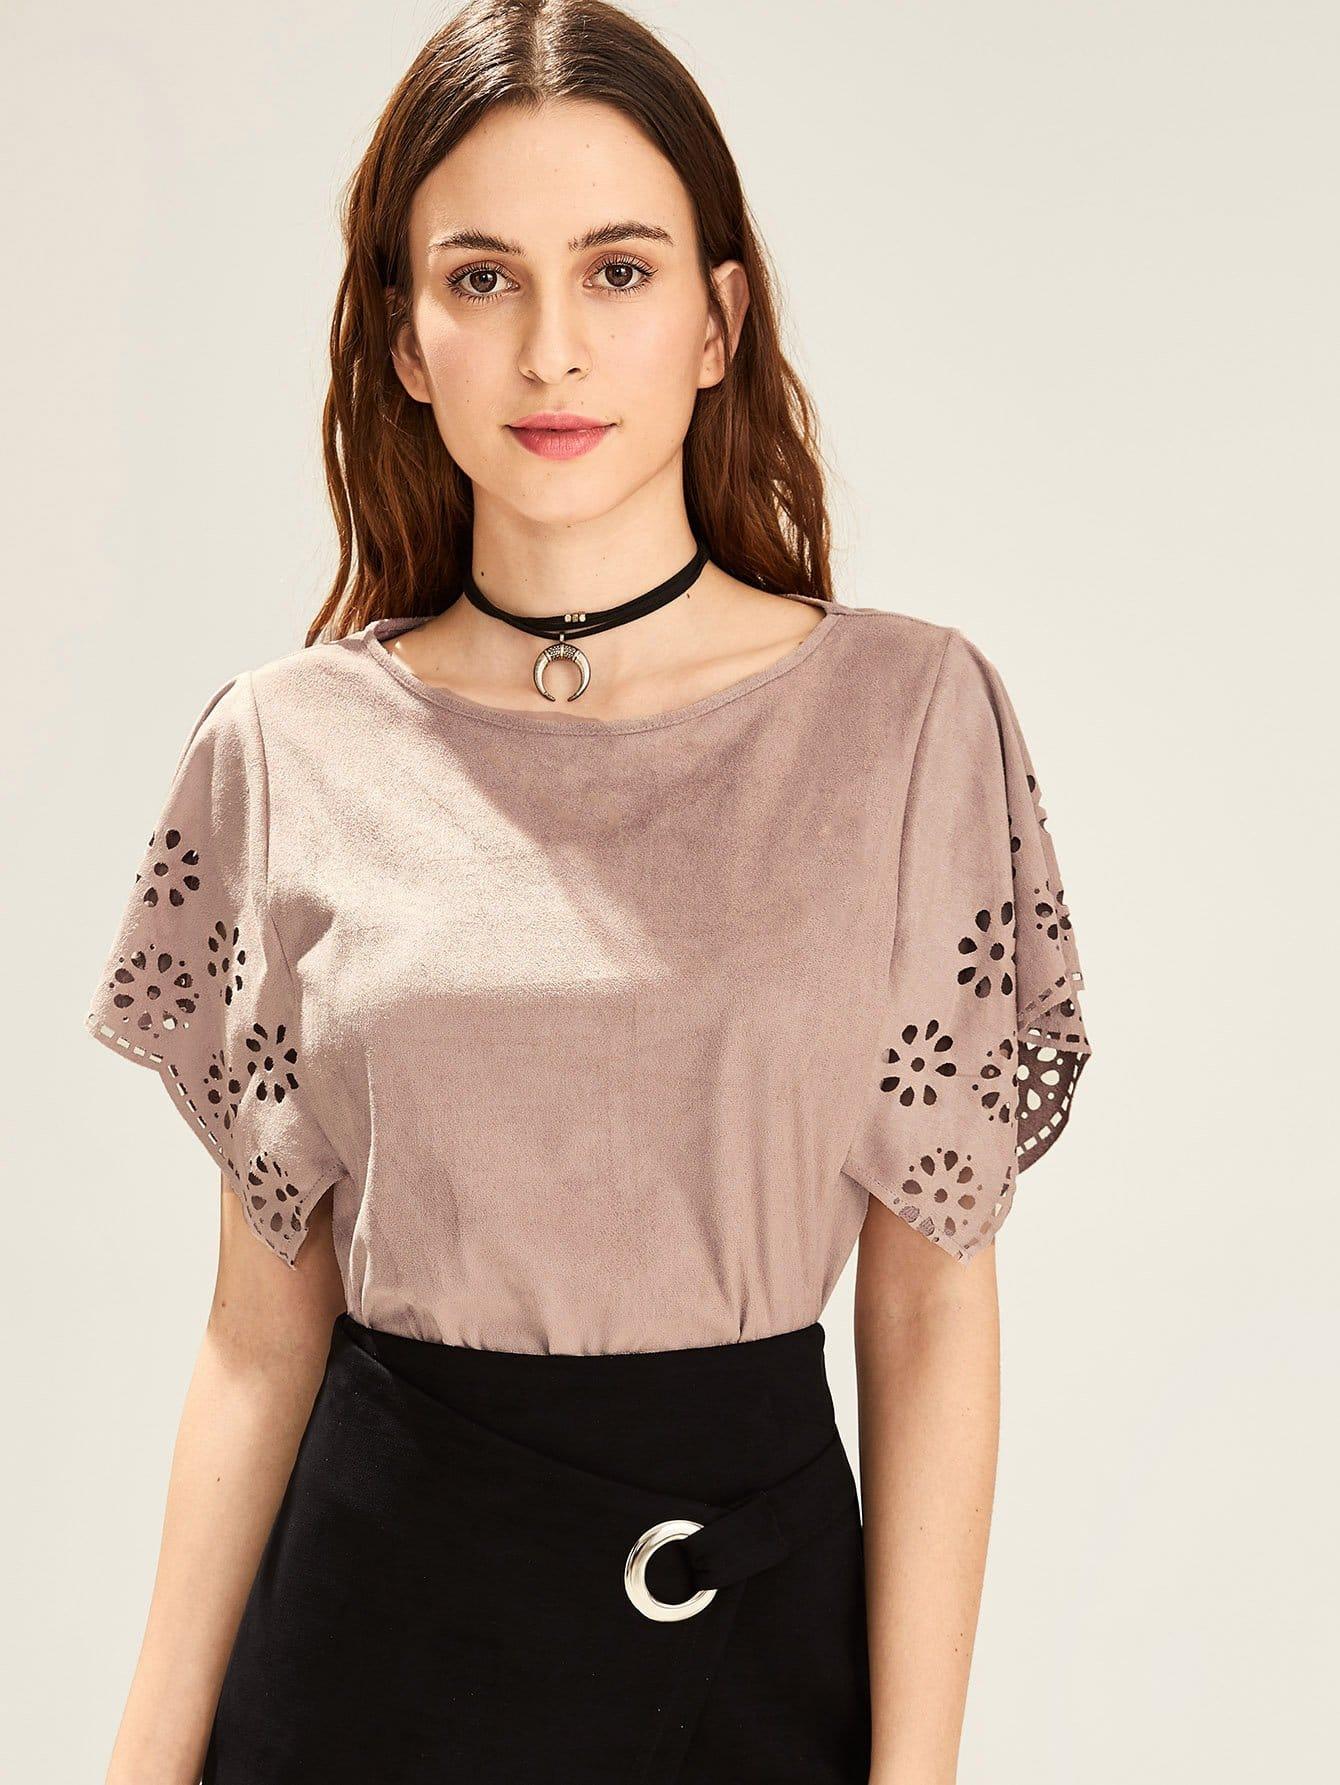 Ladies petite blouses